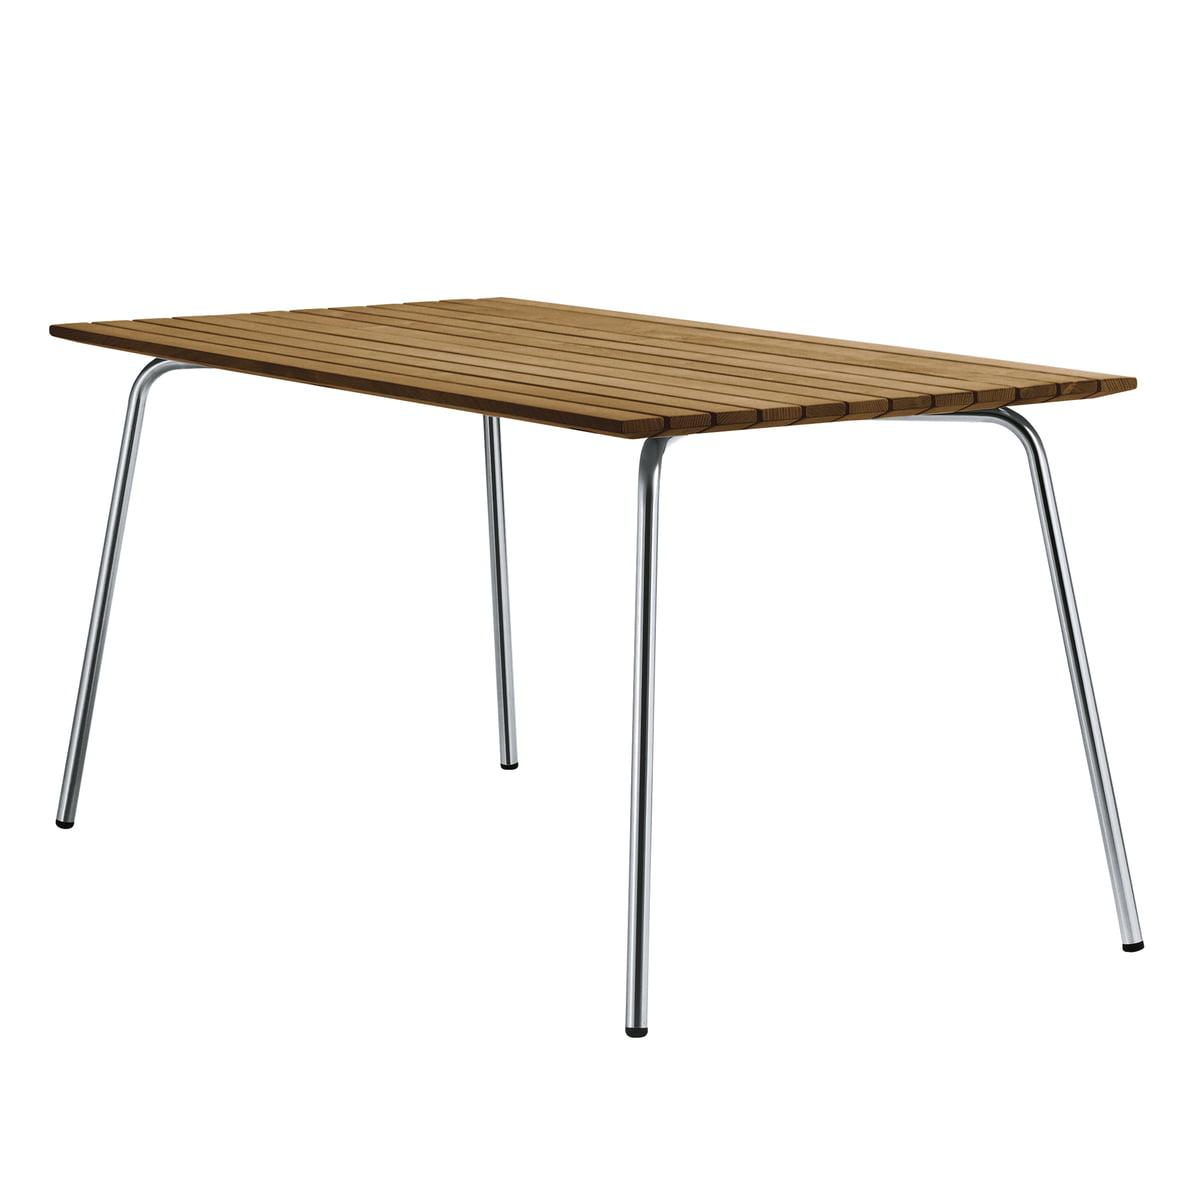 Gartentisch 150.Thonet S 1040 Garden Table 150 X 78 Cm Round Stainless Steel Tube Iroko All Seasons